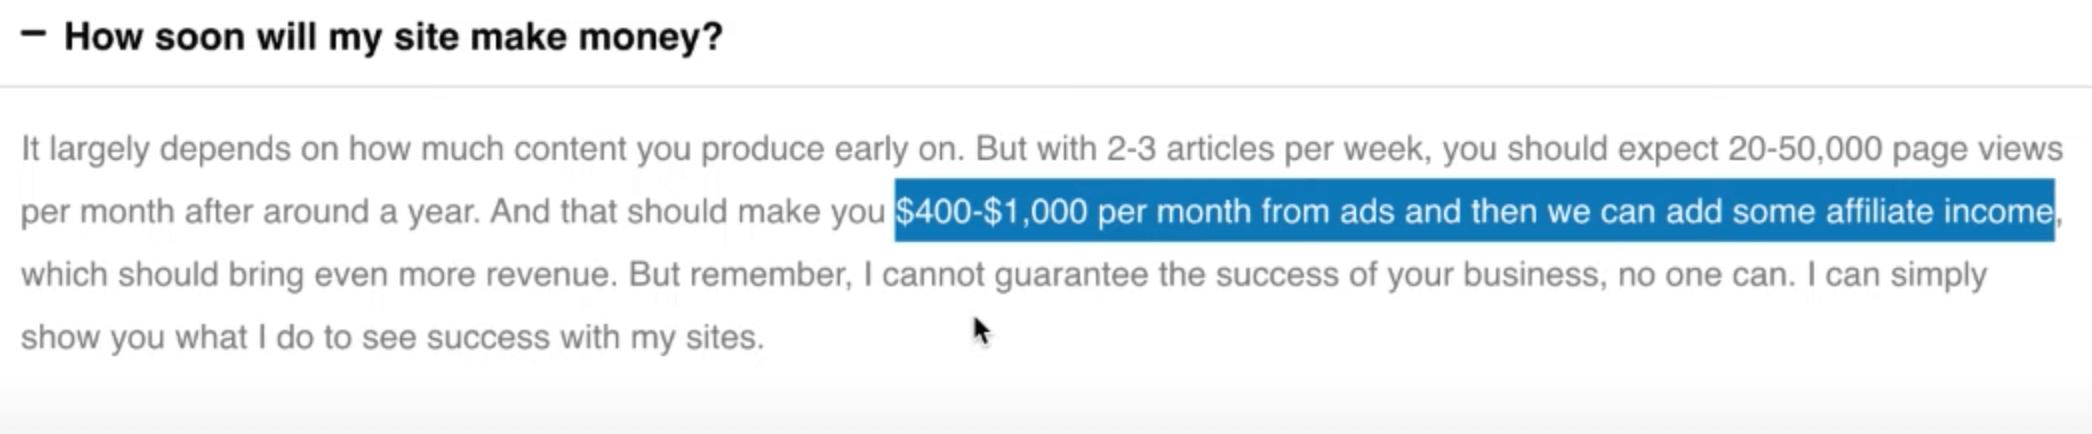 no-guarantee of income